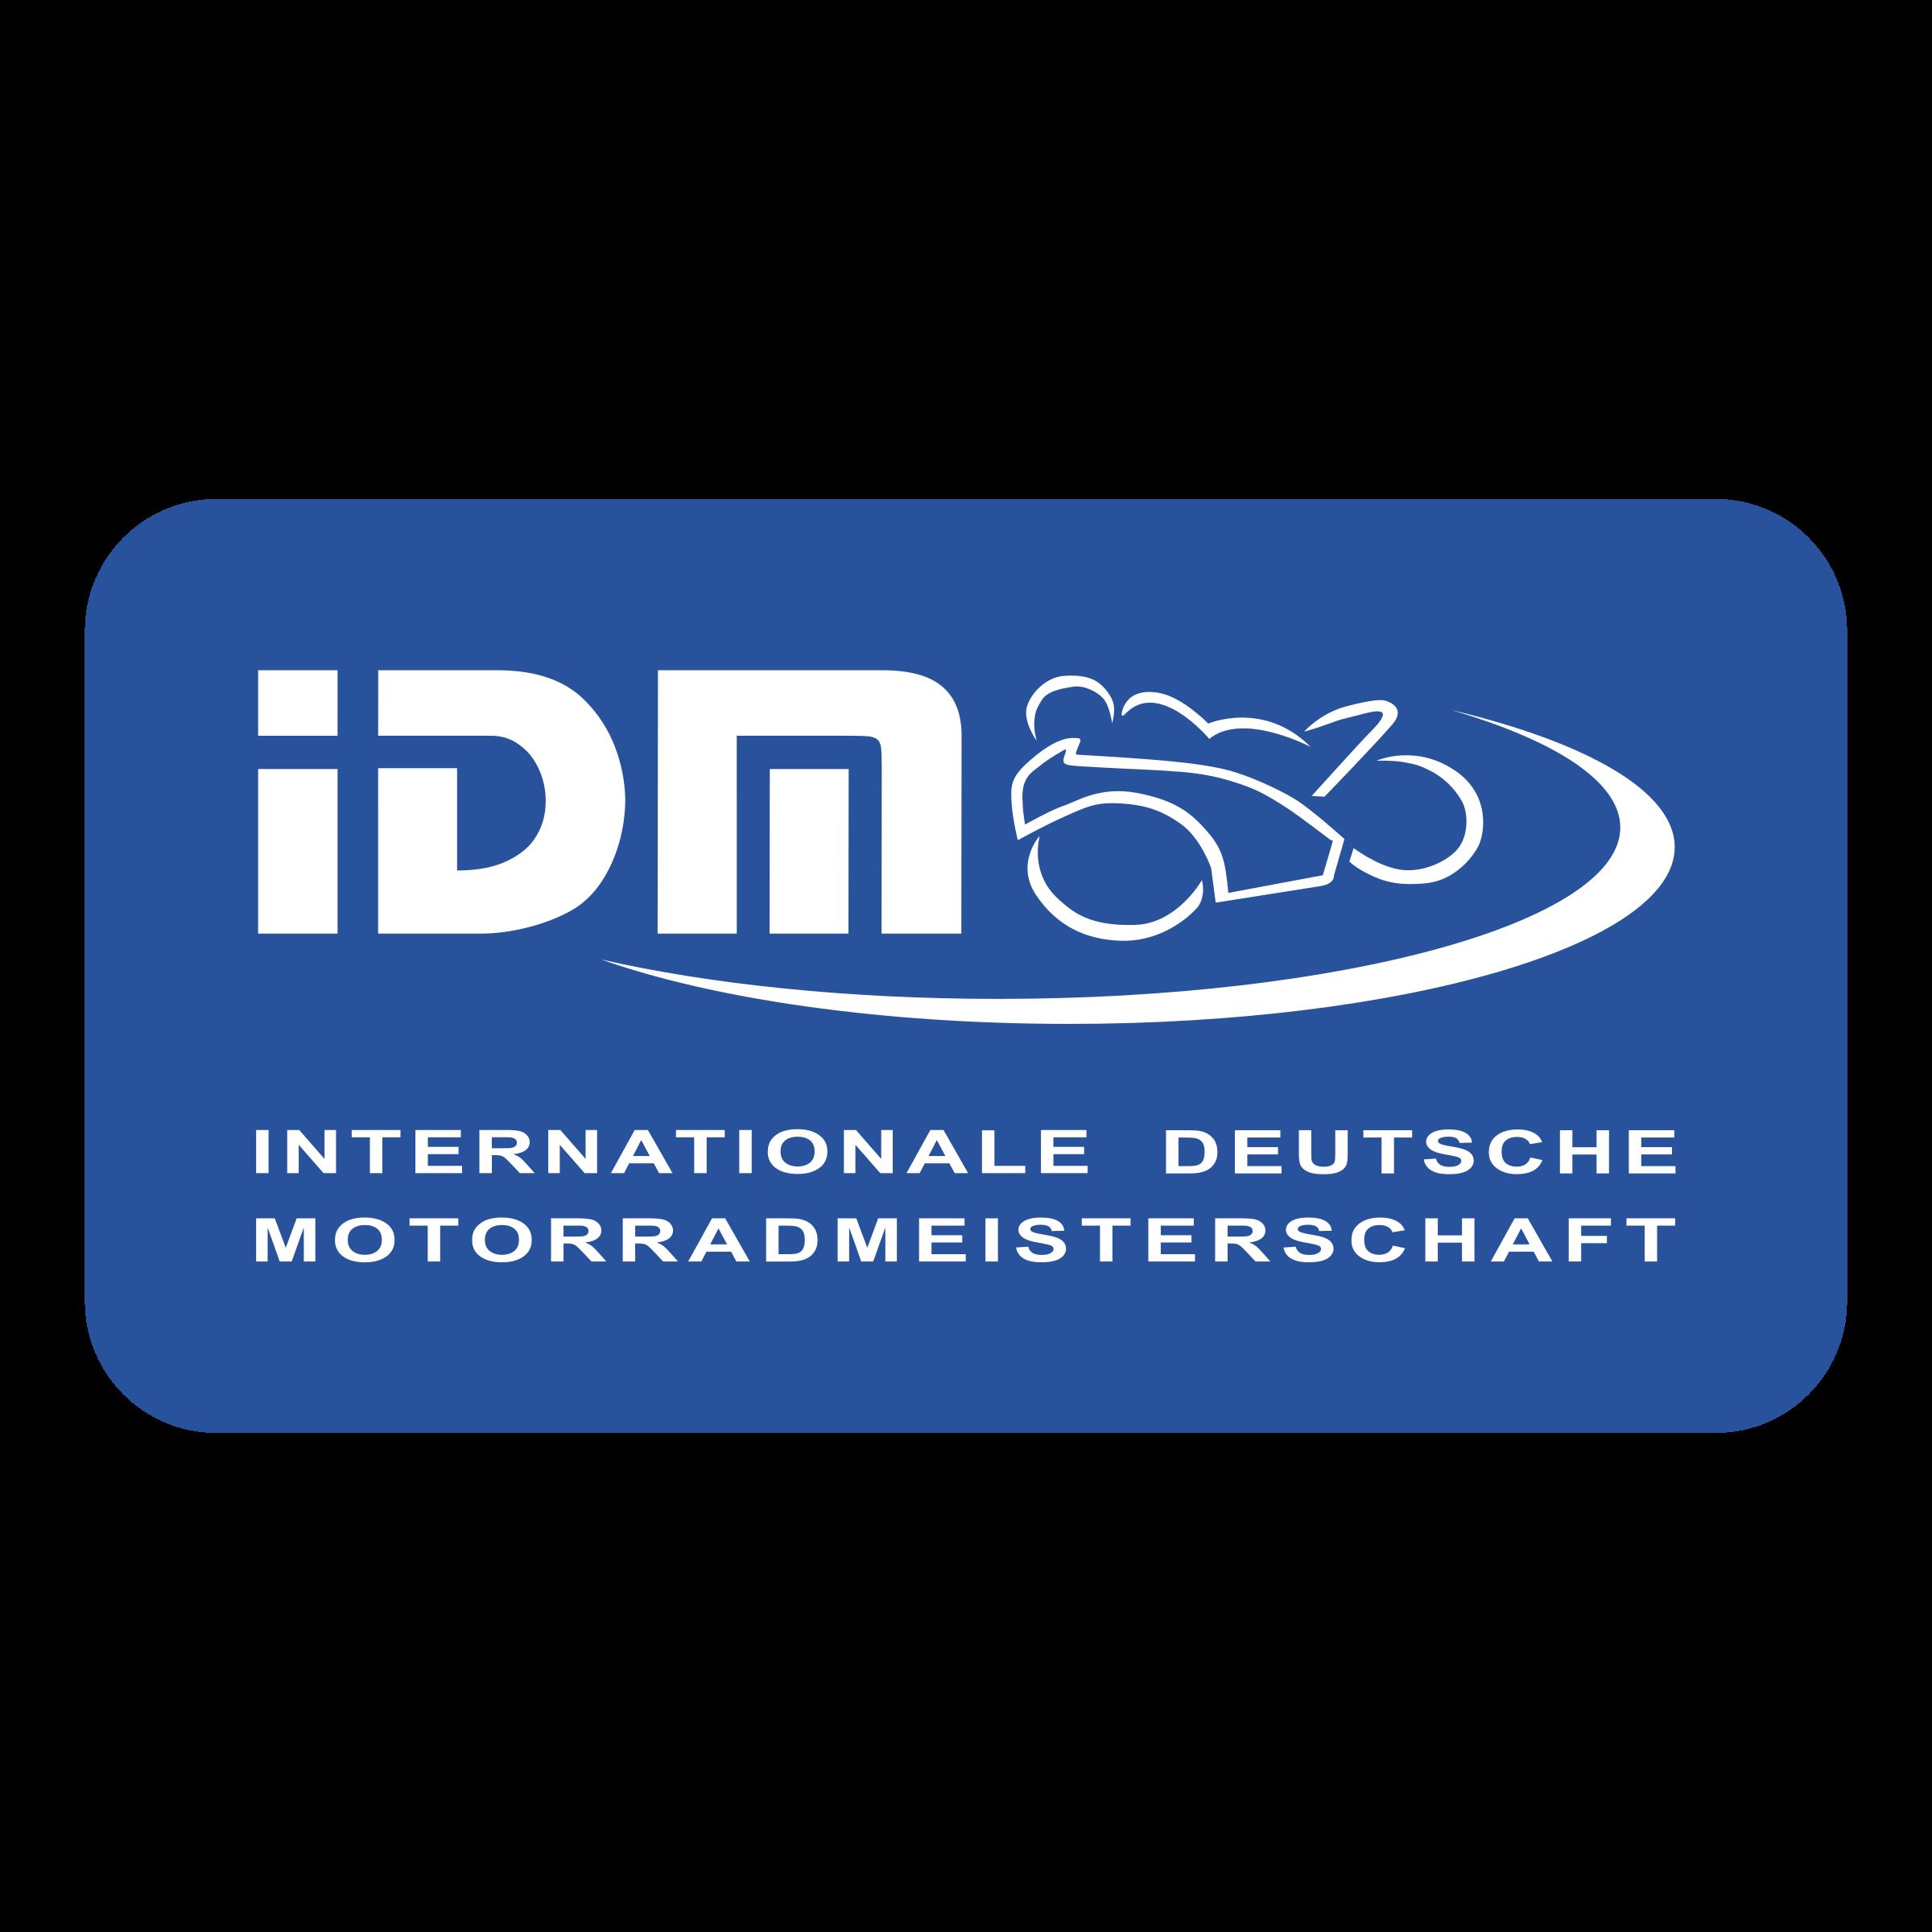 IDM Logo PNG Transparent & SVG Vector.